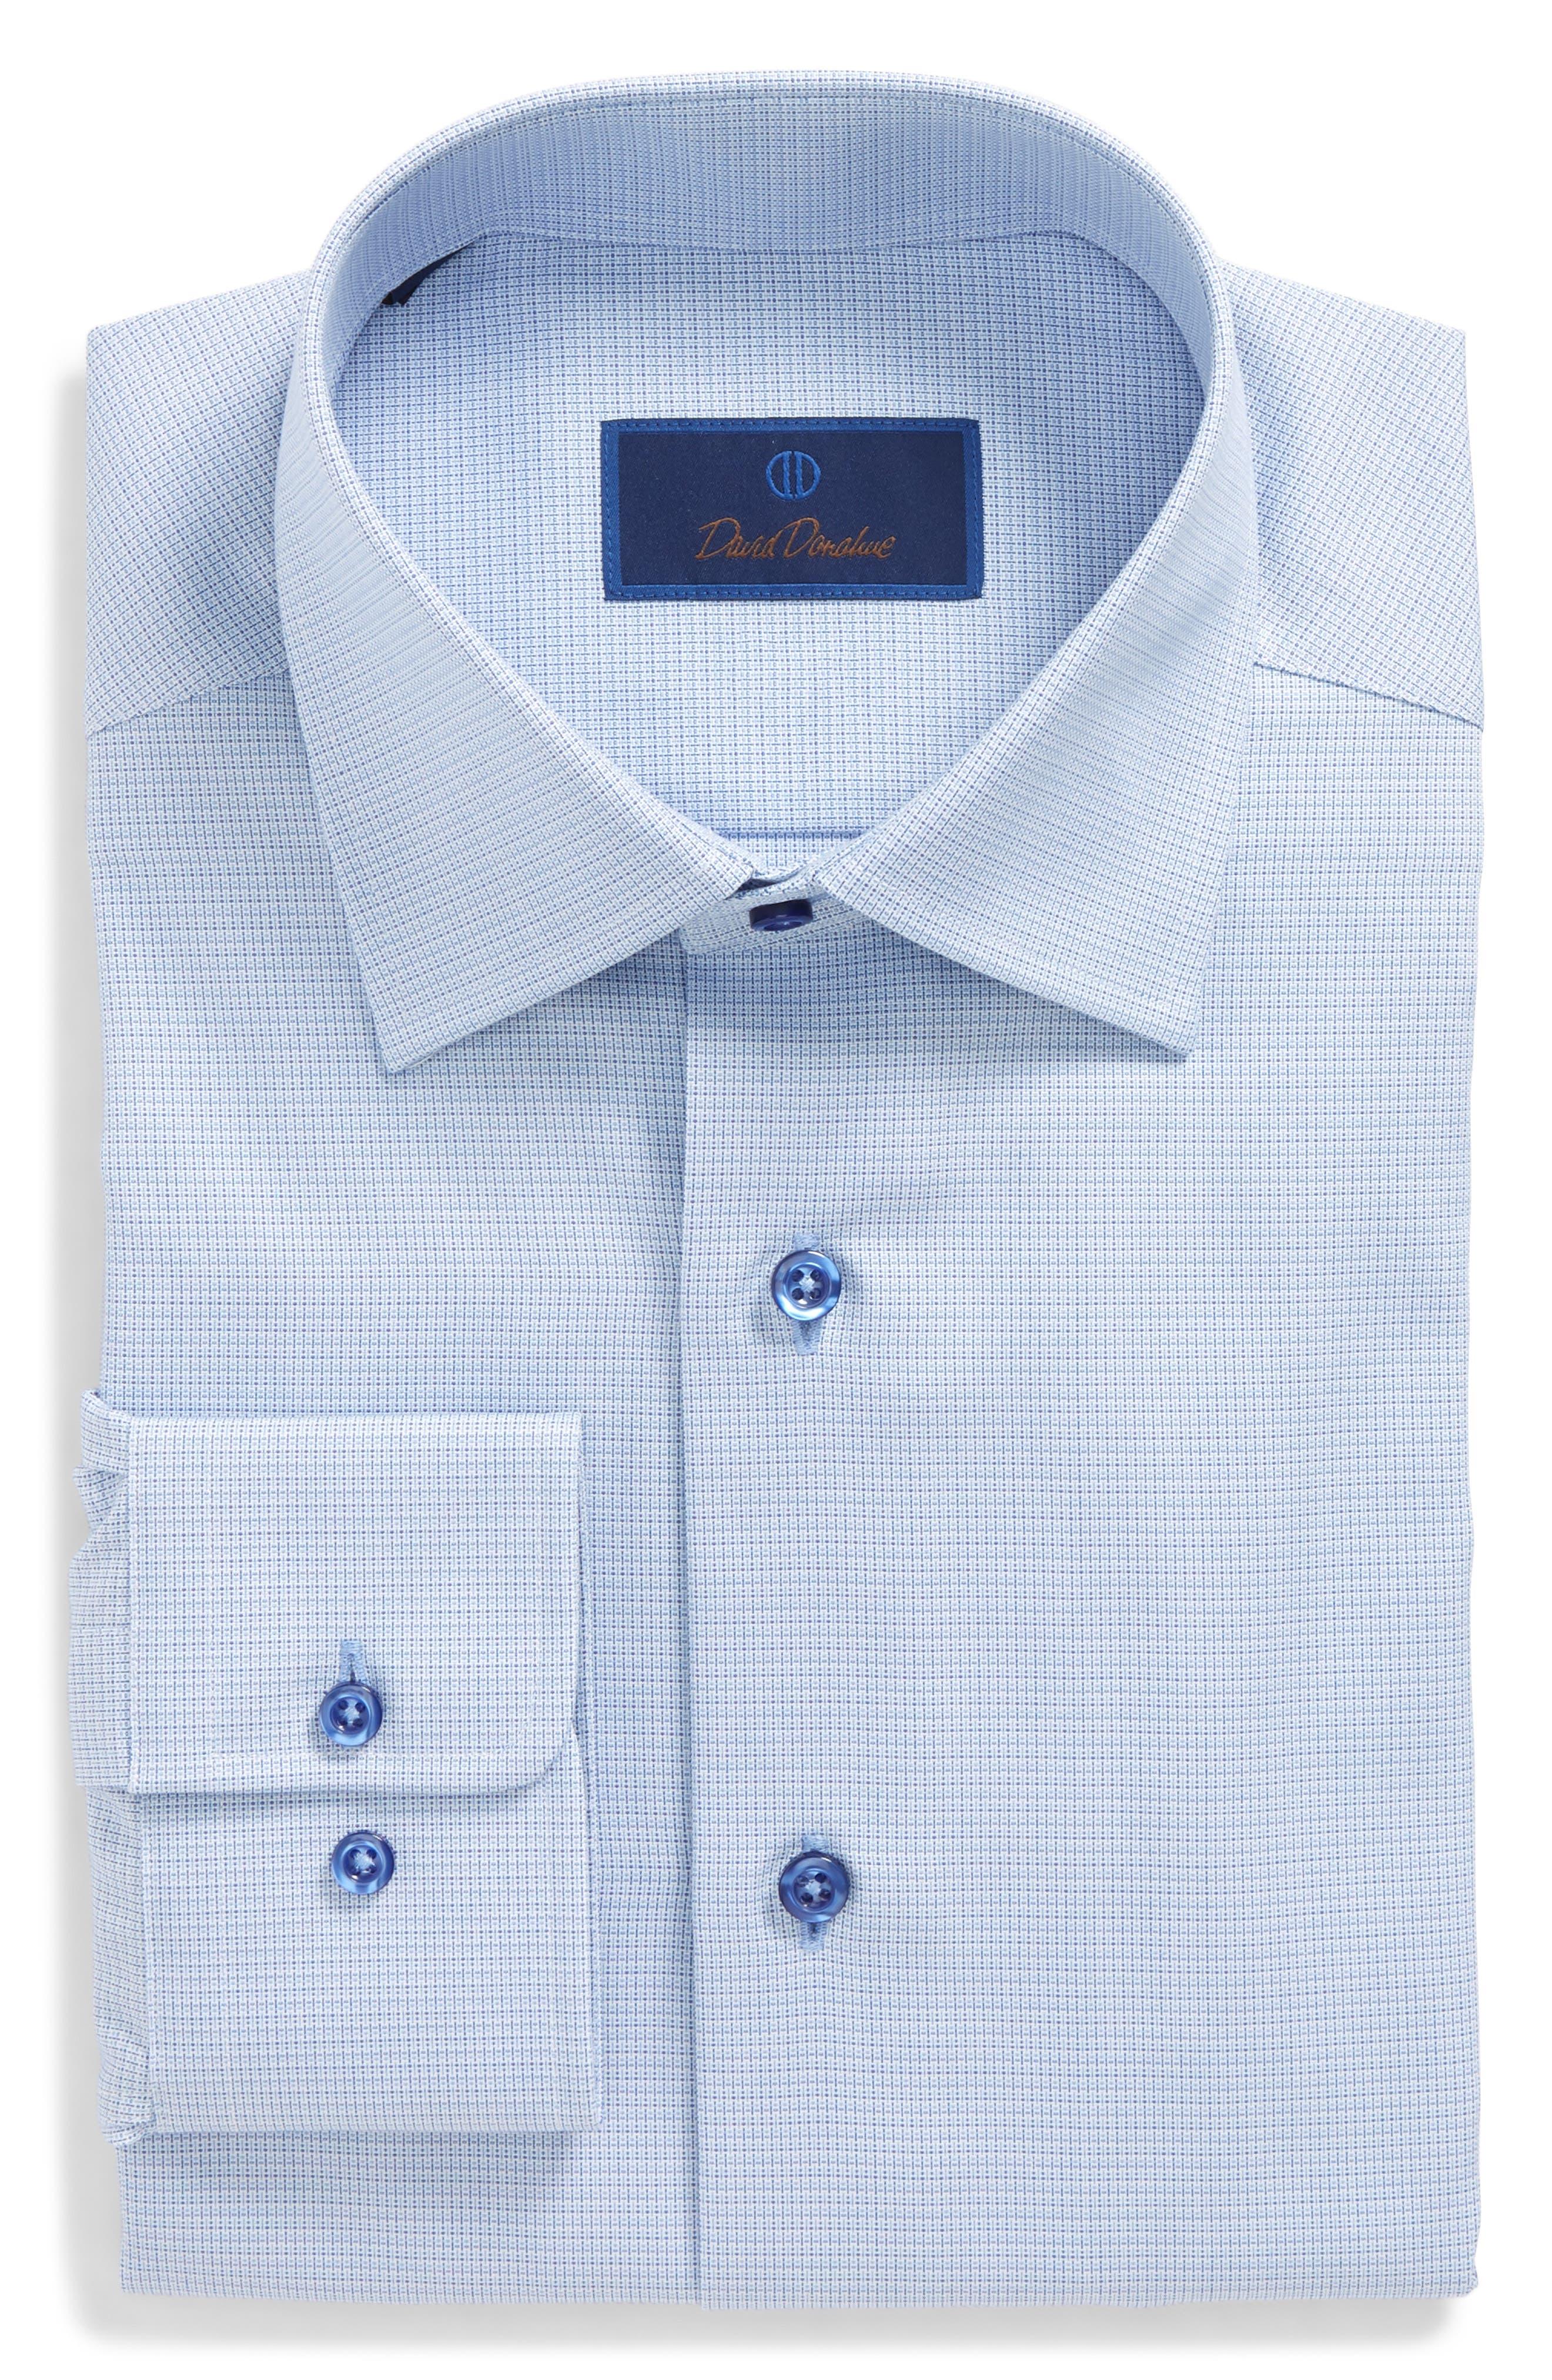 Regular Fit Solid Dress Shirt,                             Alternate thumbnail 5, color,                             423